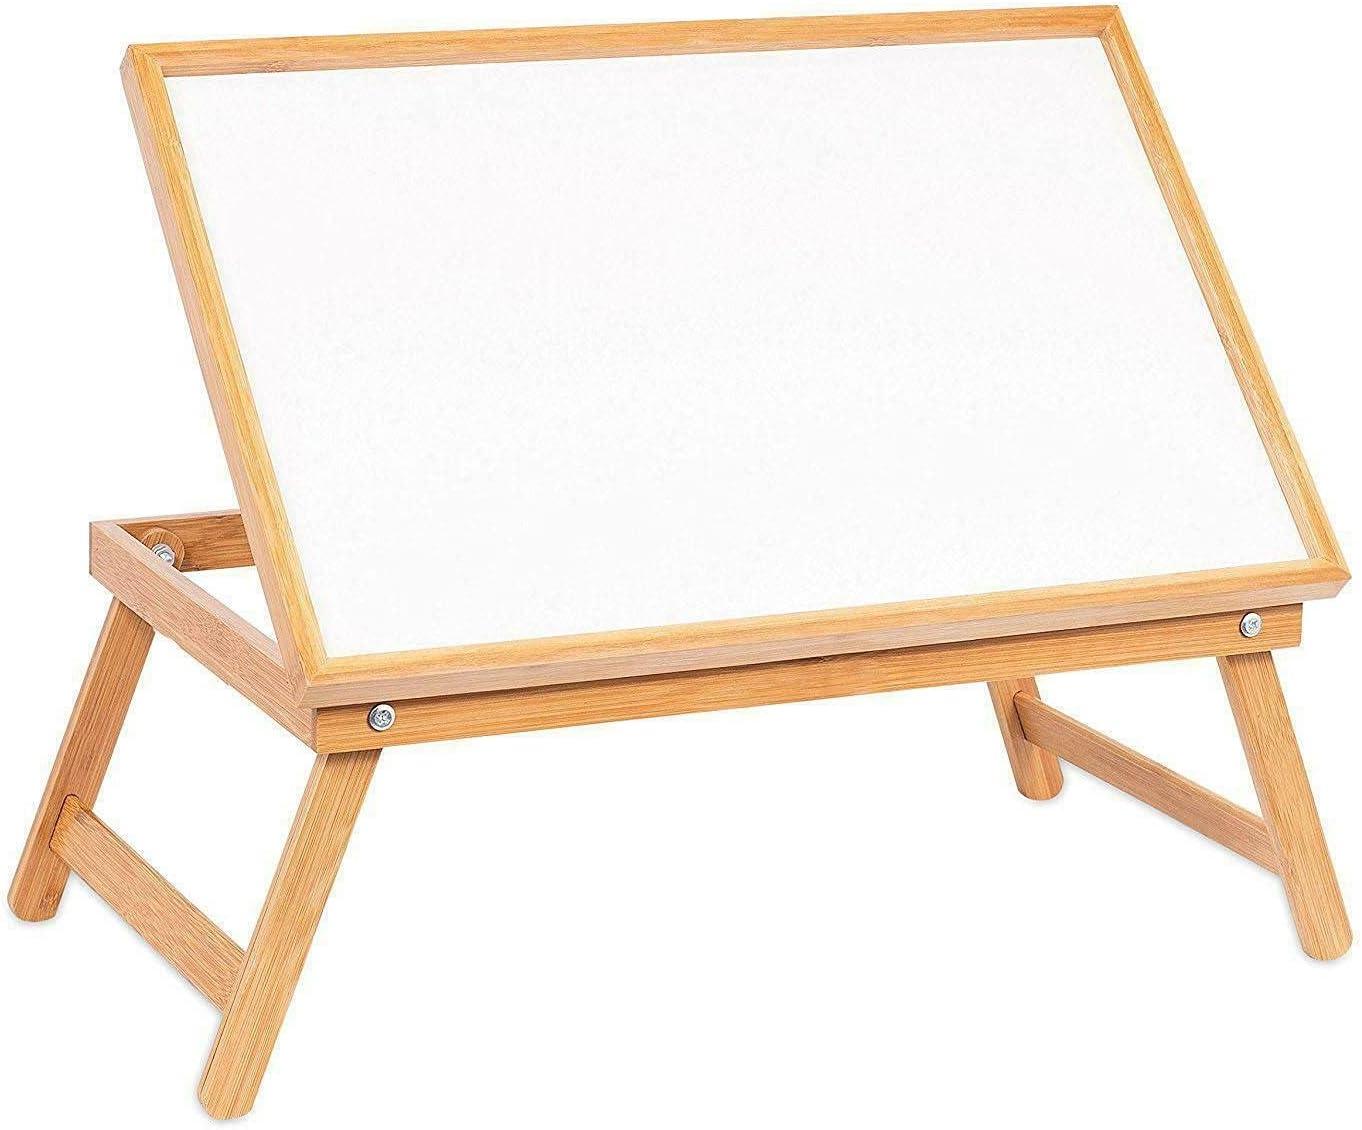 YJYDD Hot Adjustable Bed 2021 model Tray Lap Table Desk Foldable Serving 100% quality warranty! Le